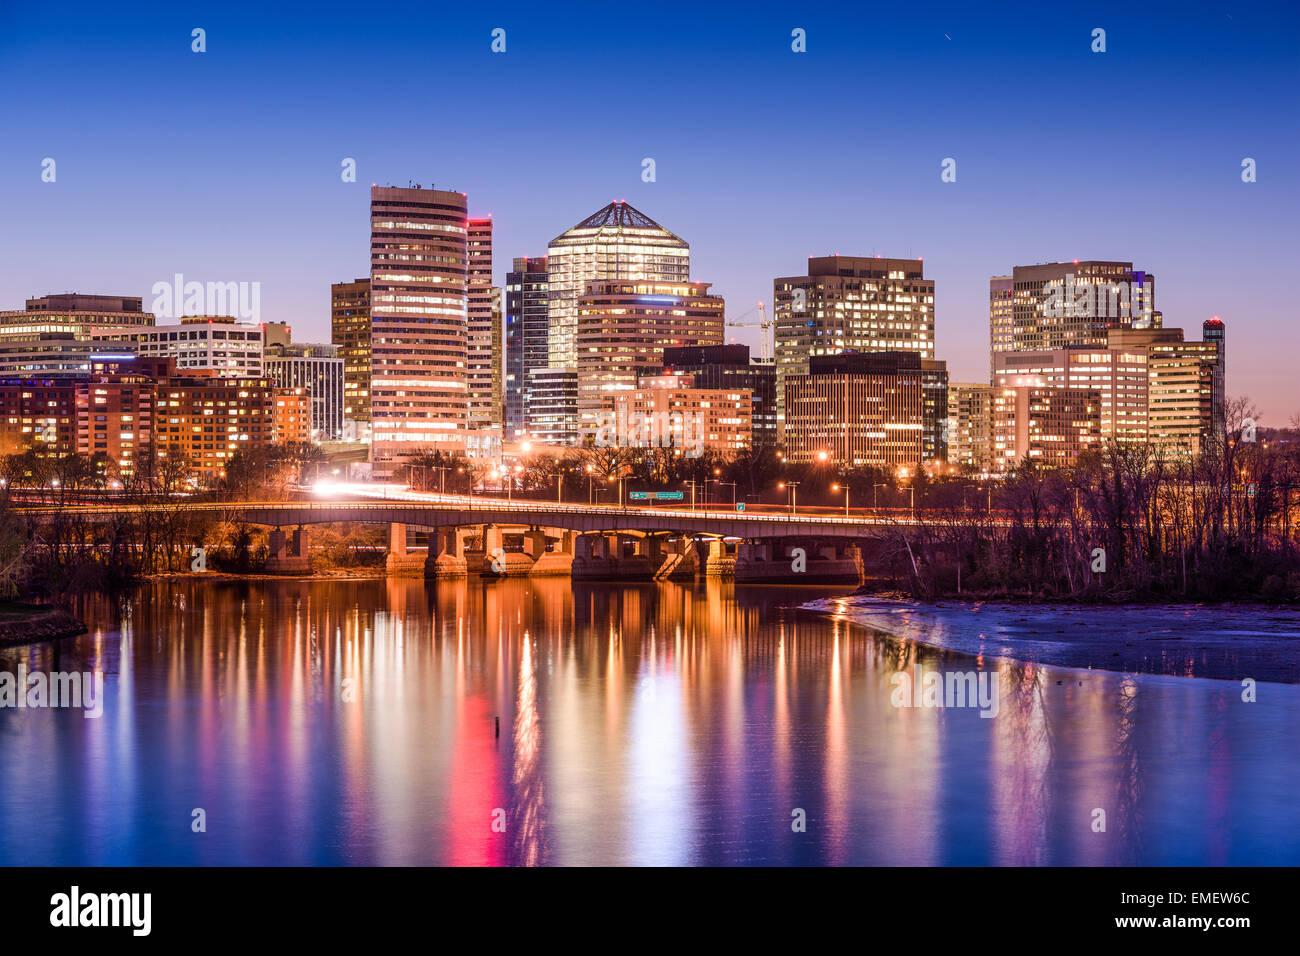 Rosslyn, Arlington, Virginia, USA skyline on the Potomac River. - Stock Image